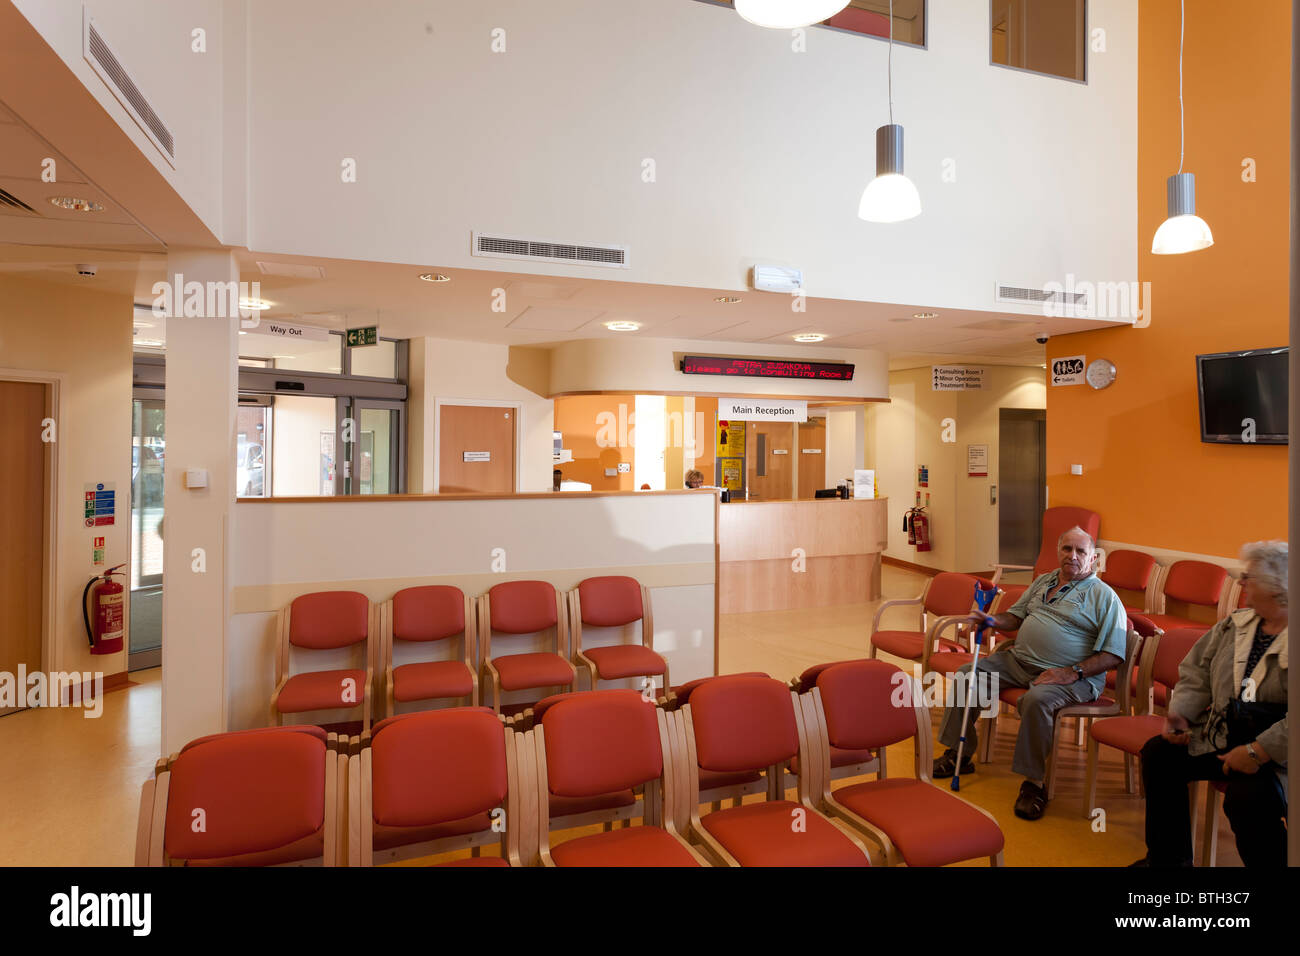 Reception waiting room at Gosport Medical Centre - Stock Image